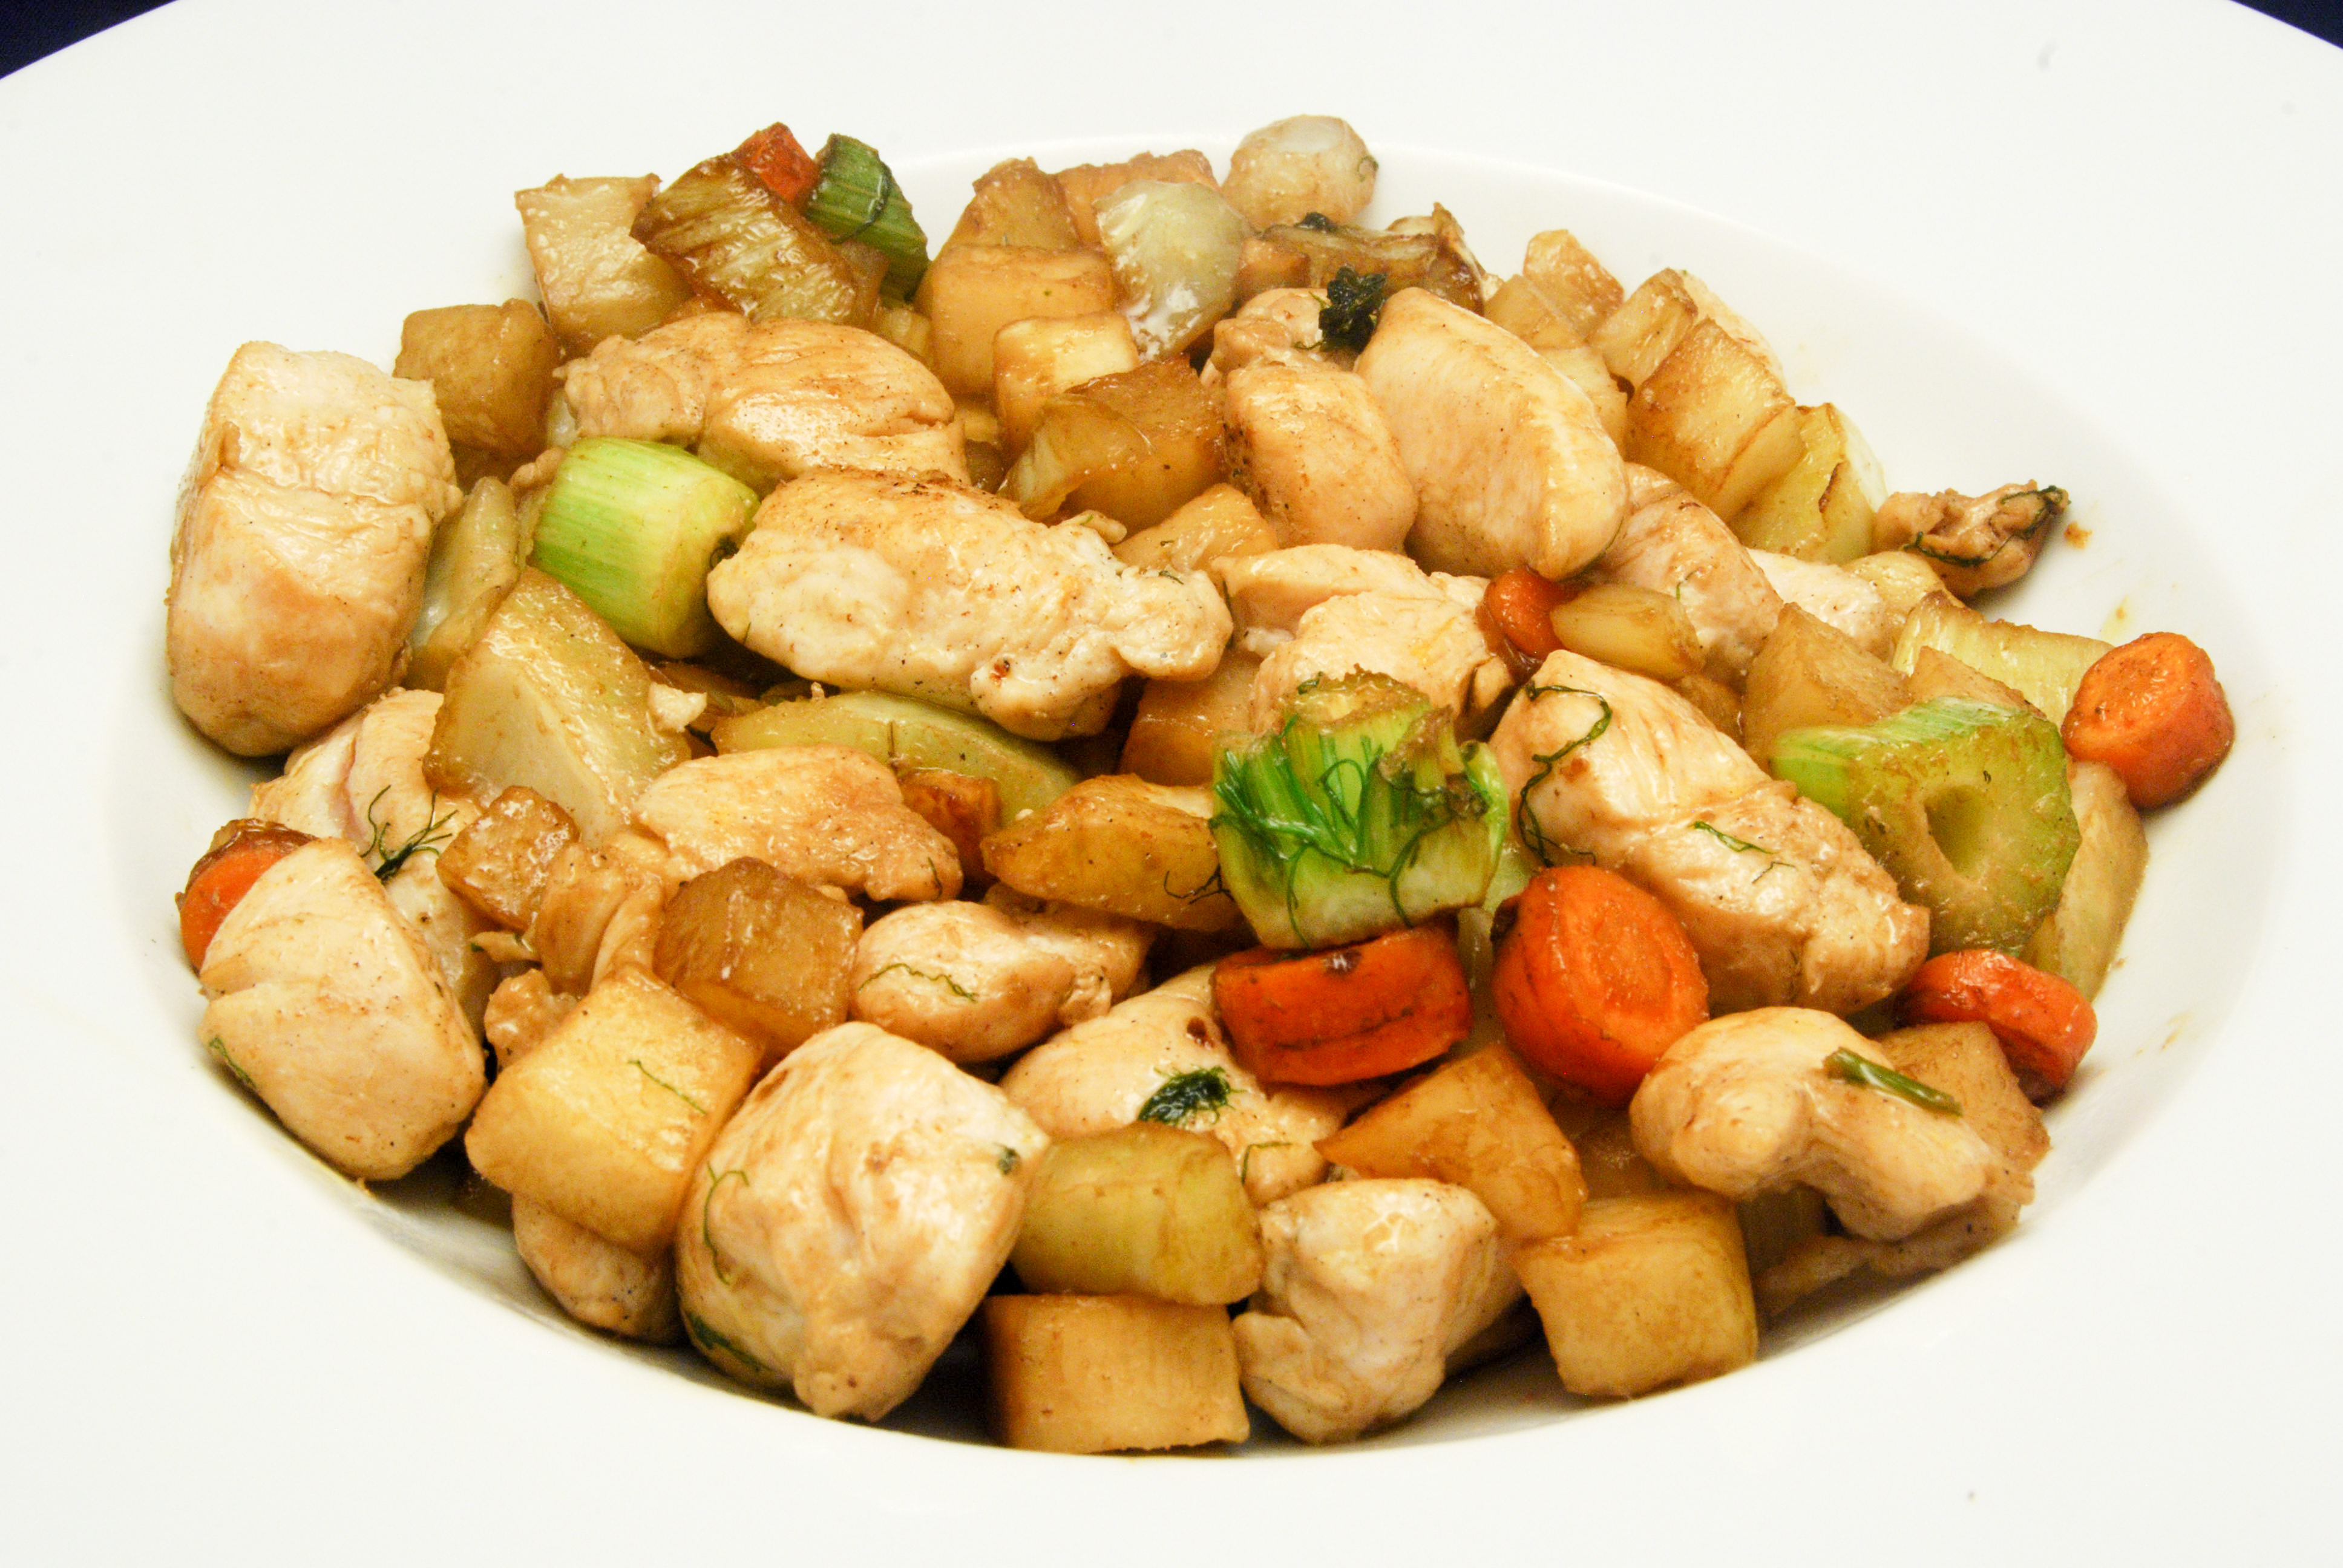 Hähnchen-Gemüse-Teller